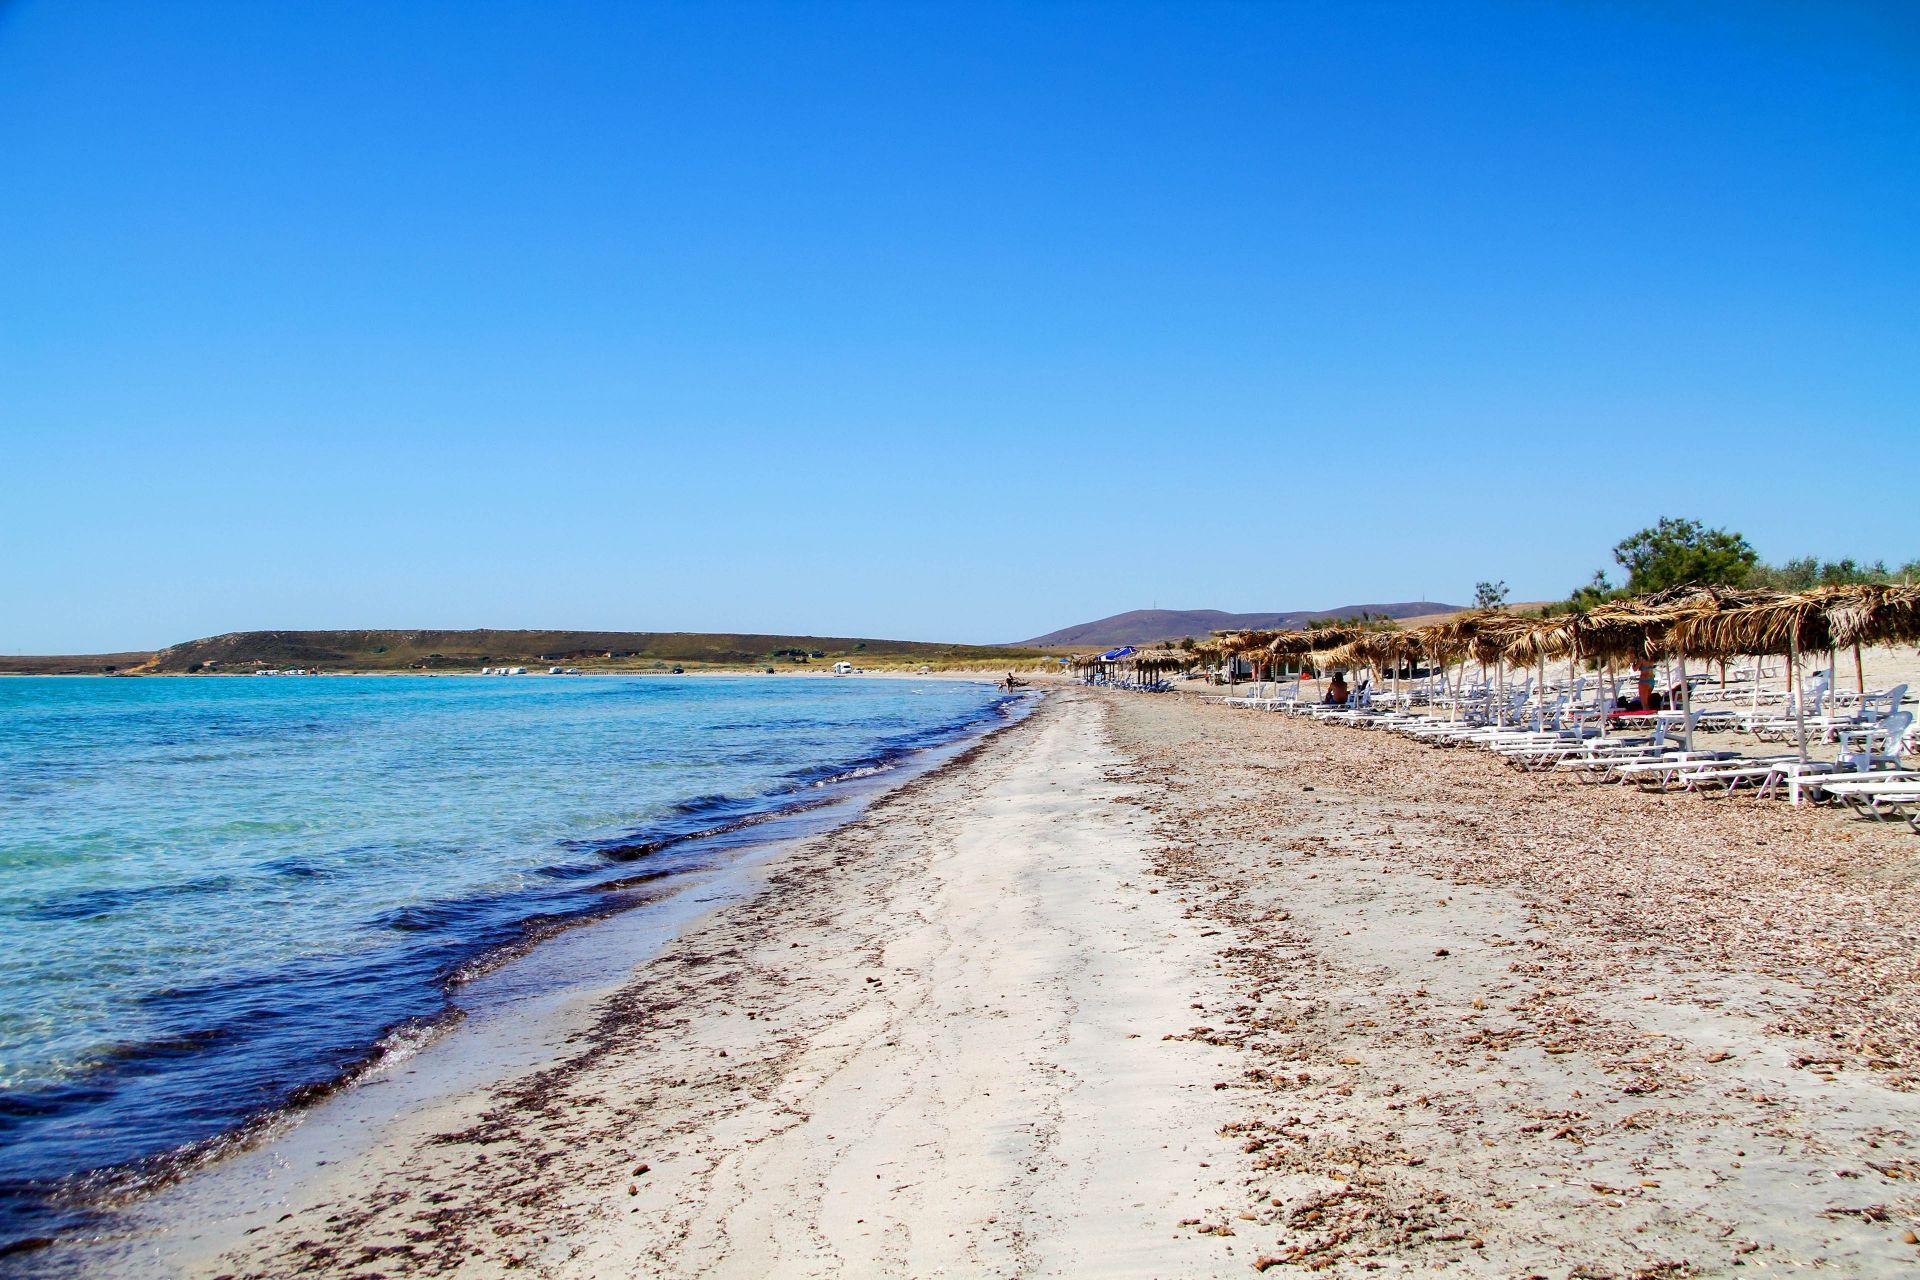 Lemnos island: Keros beach